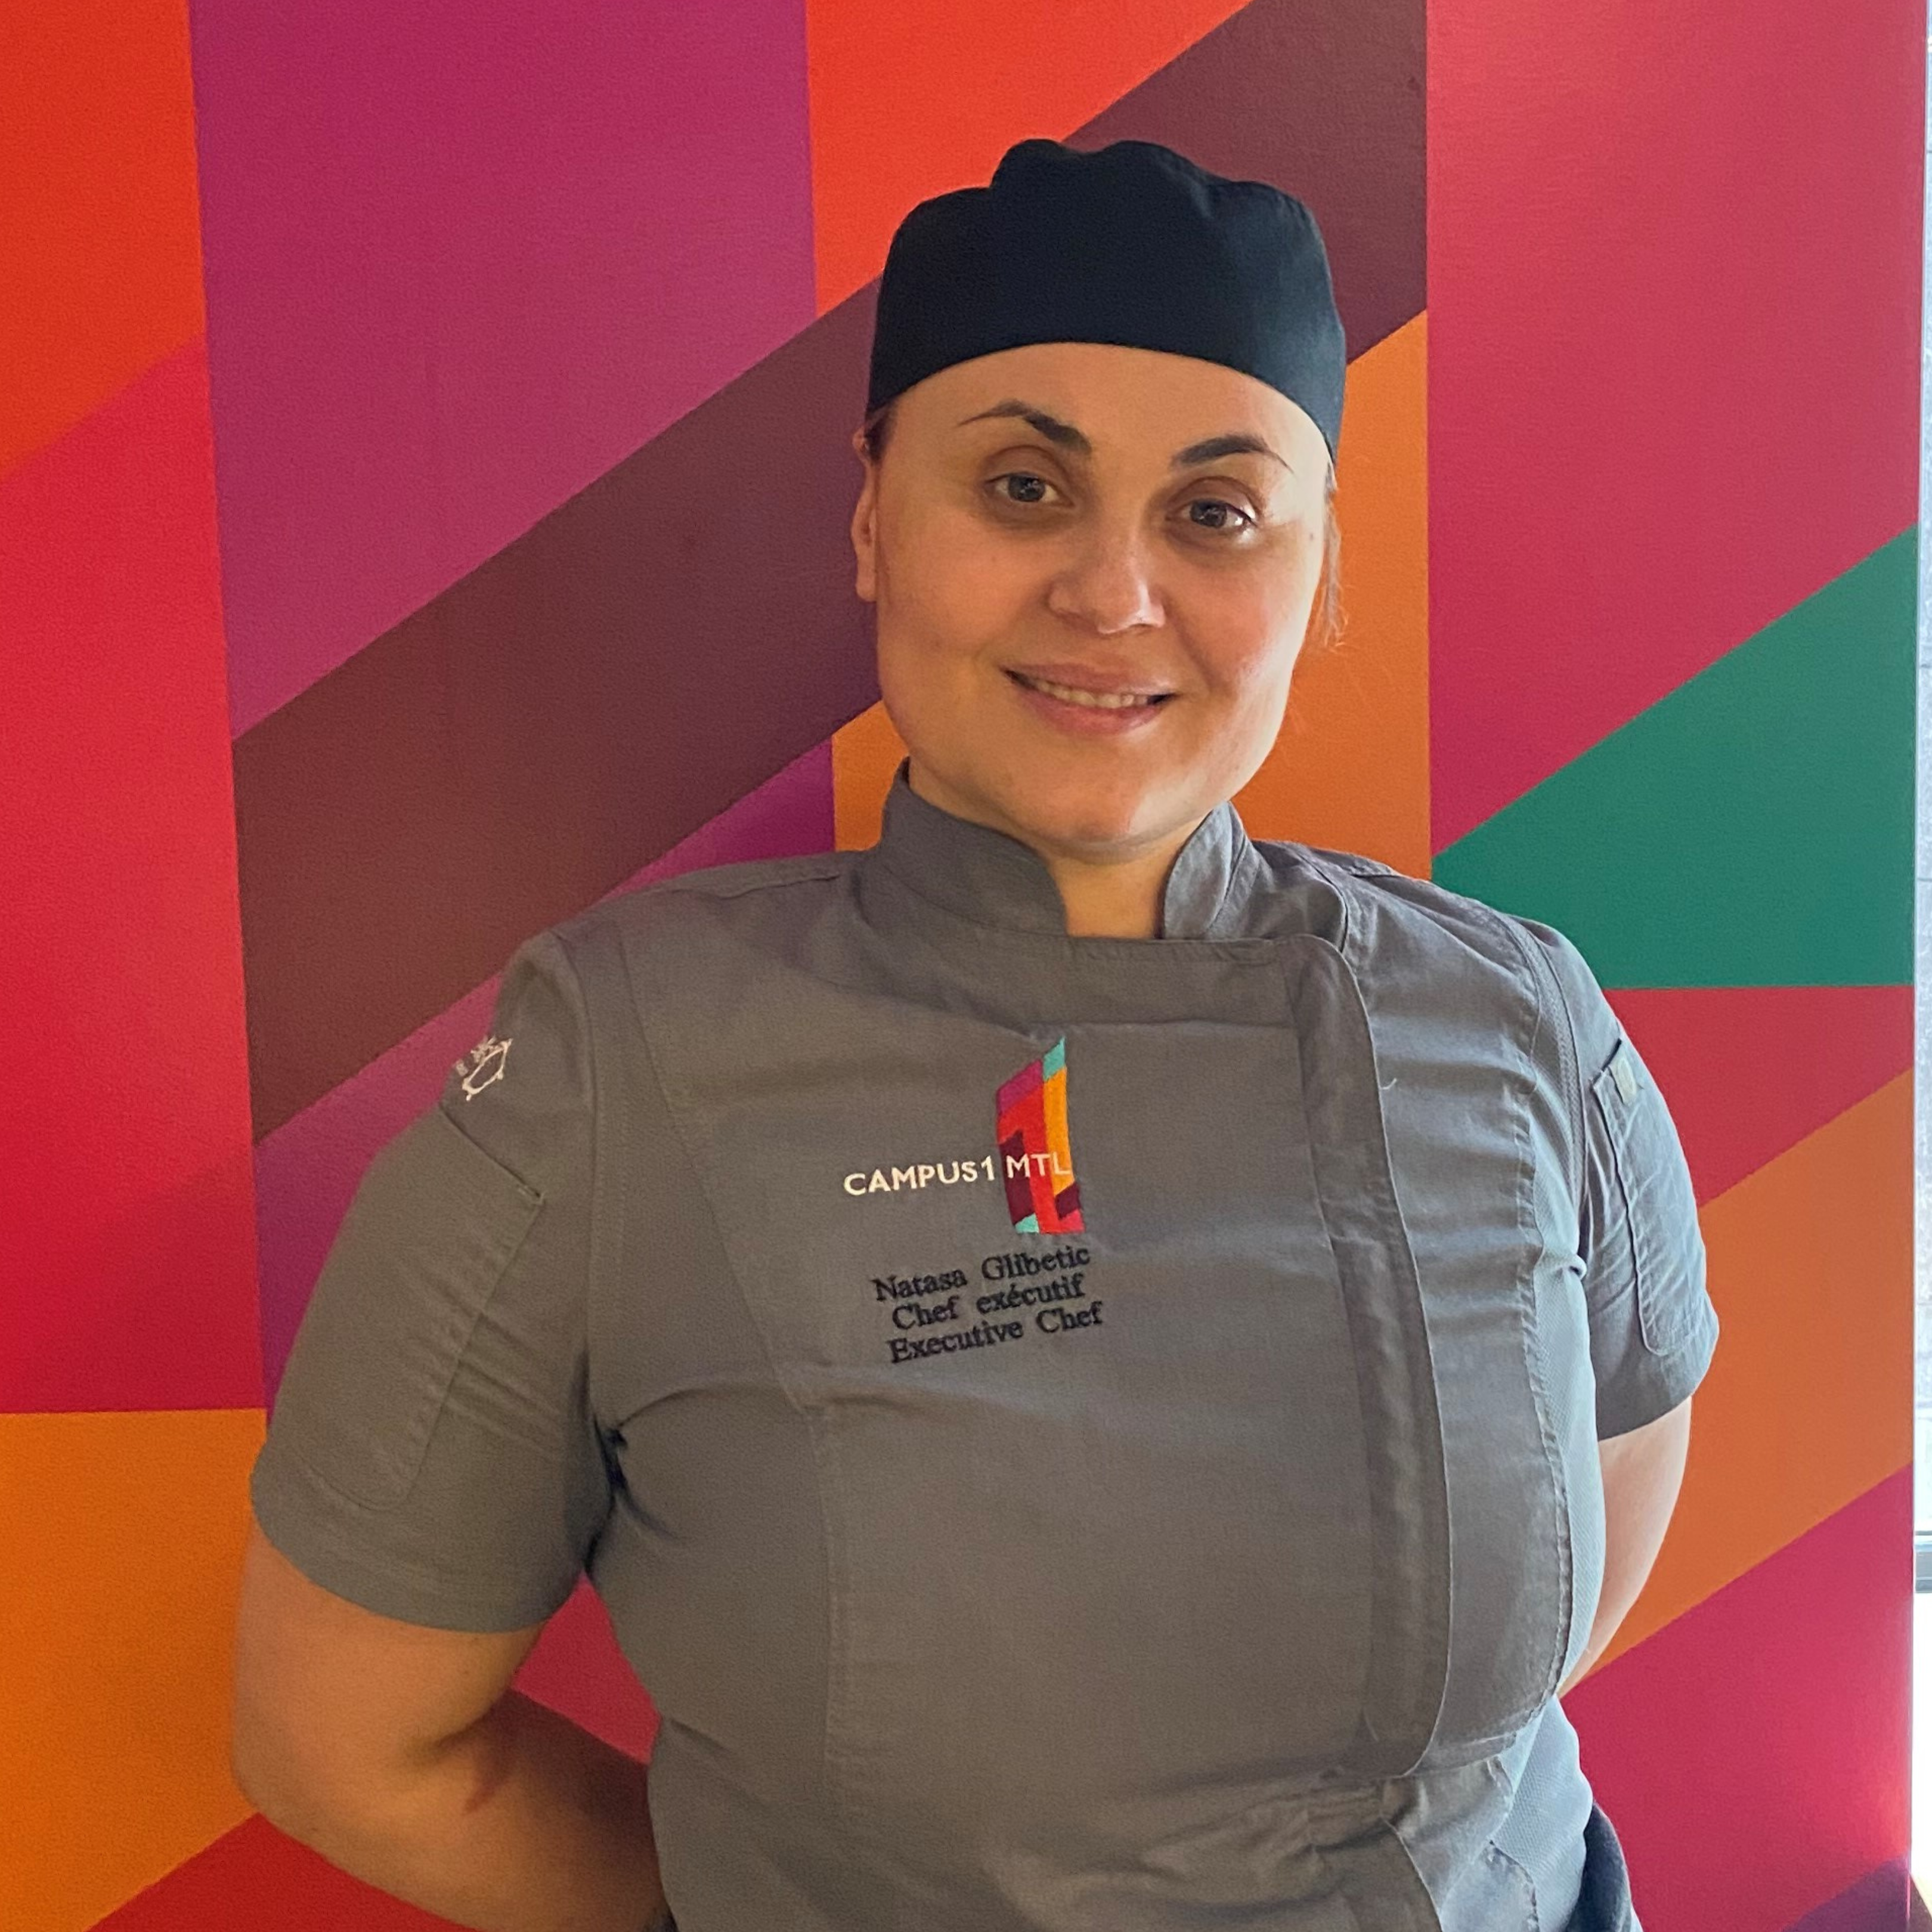 Natasa Glibetic   - Executive Chef